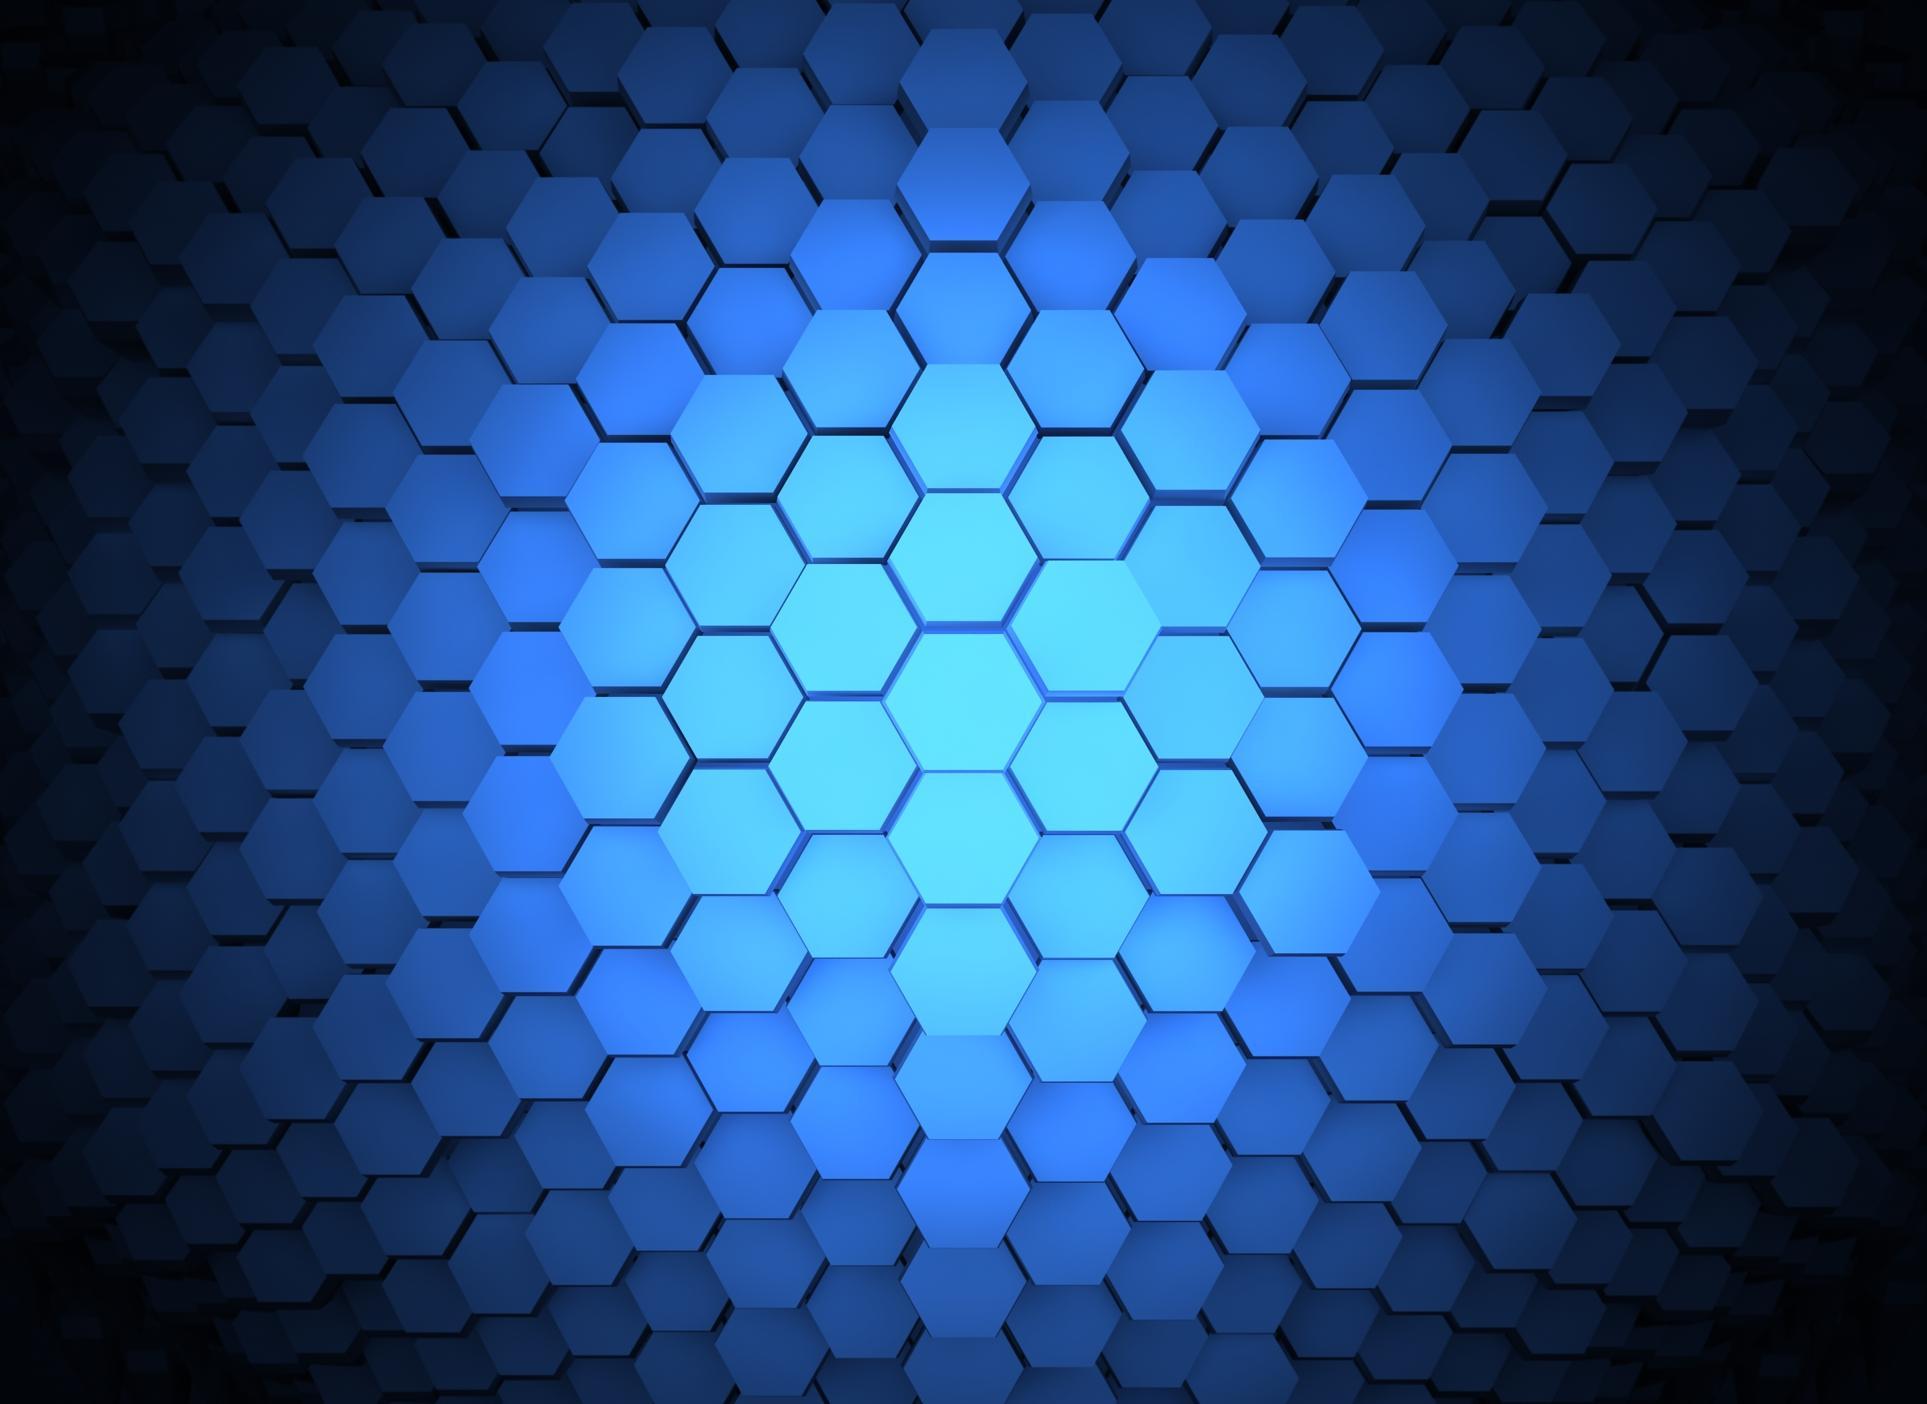 Blue Hexagon Wallpaper  WallpaperSafari